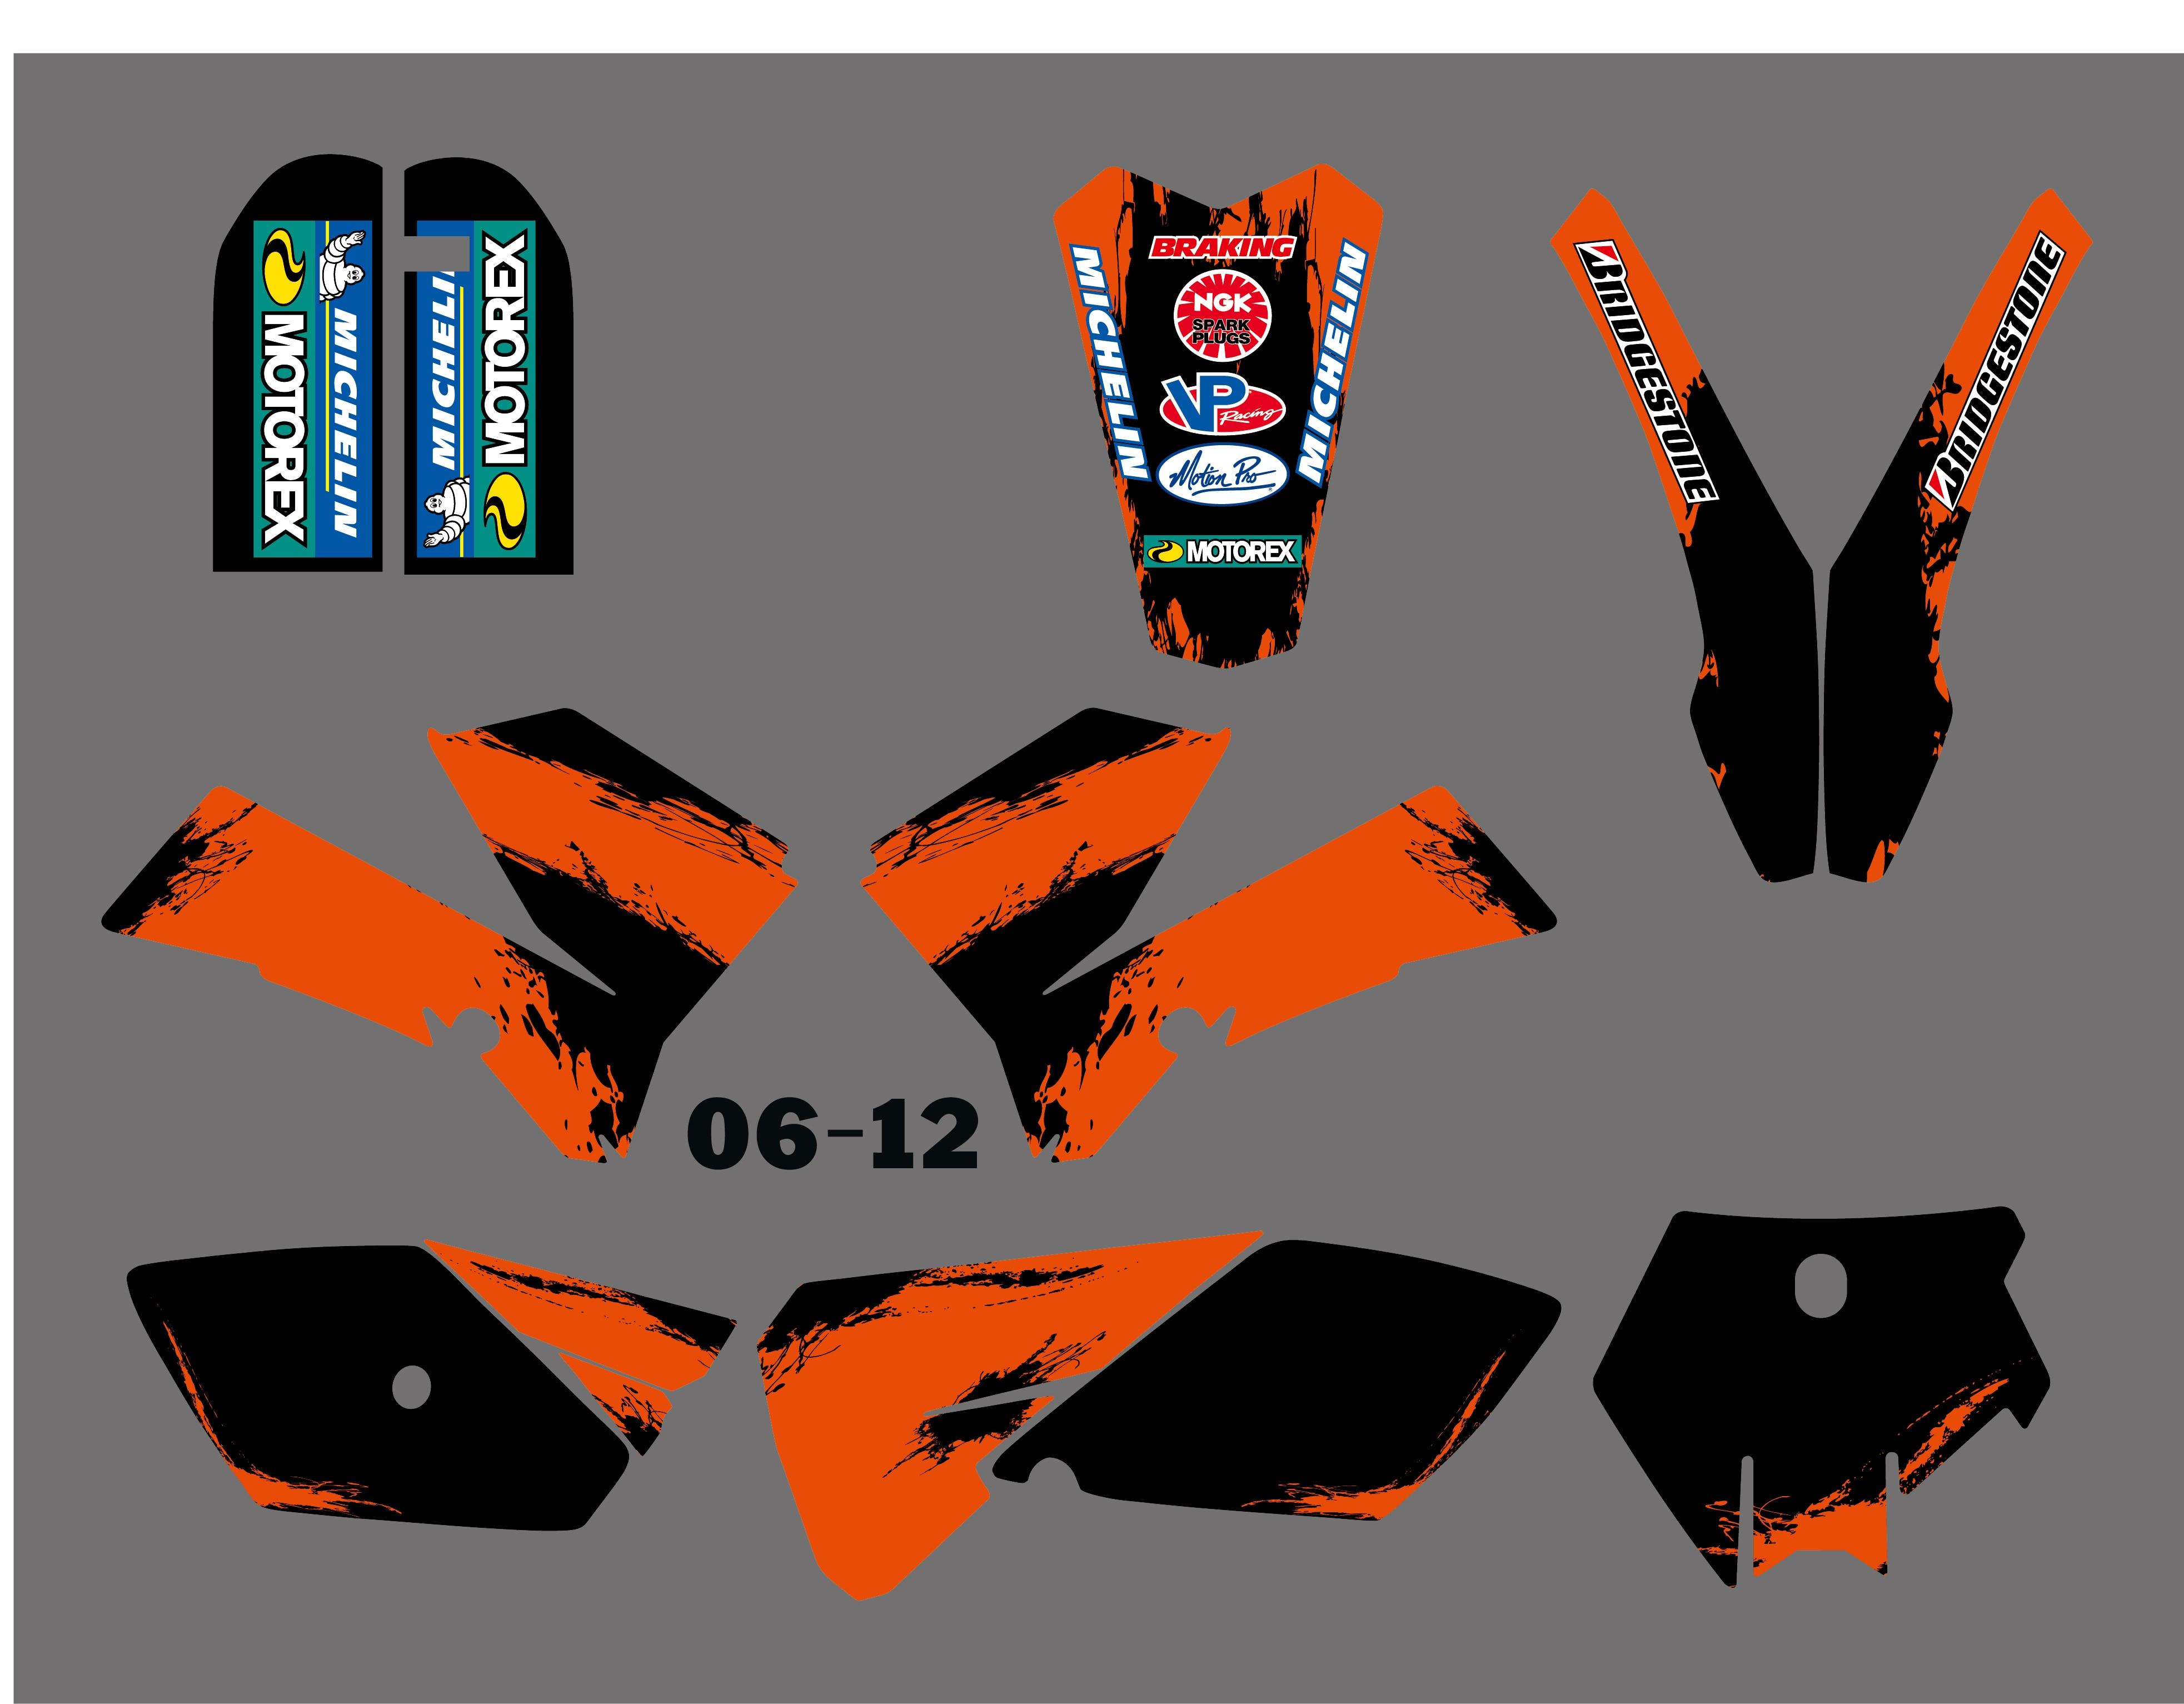 H2CNC الرسومات و خلفية صائق ملصقا أطقم صالح لل KTM SX 85 SX85 2006 2007 2008 2009 2010 2011 2012